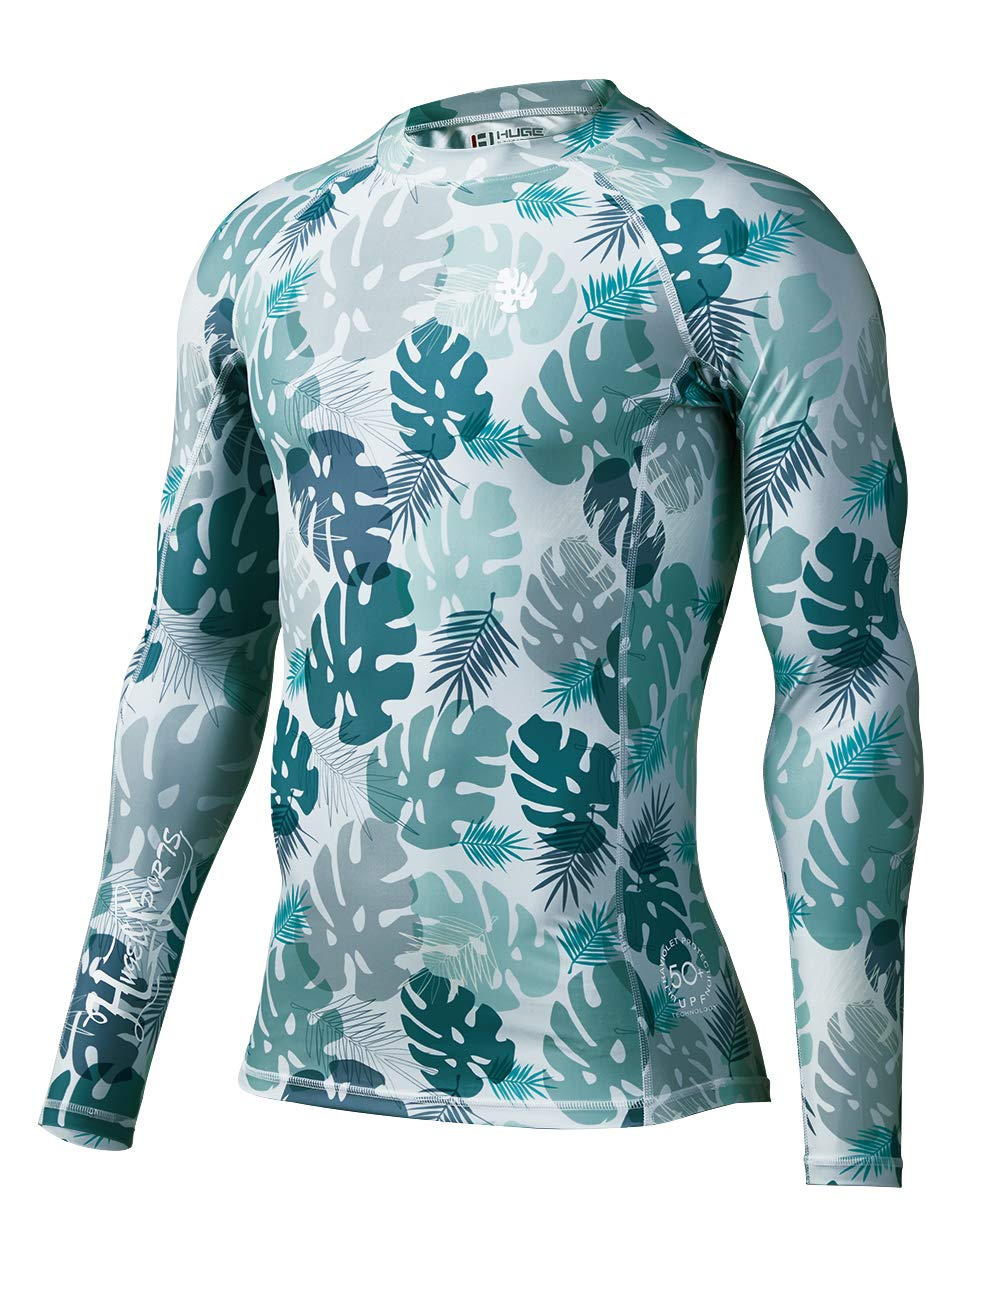 70a2bbd8 HUGE SPORTS Men's Splice UV Sun Protection UPF 50+ Skins Rash Guard Long  Sleeves product